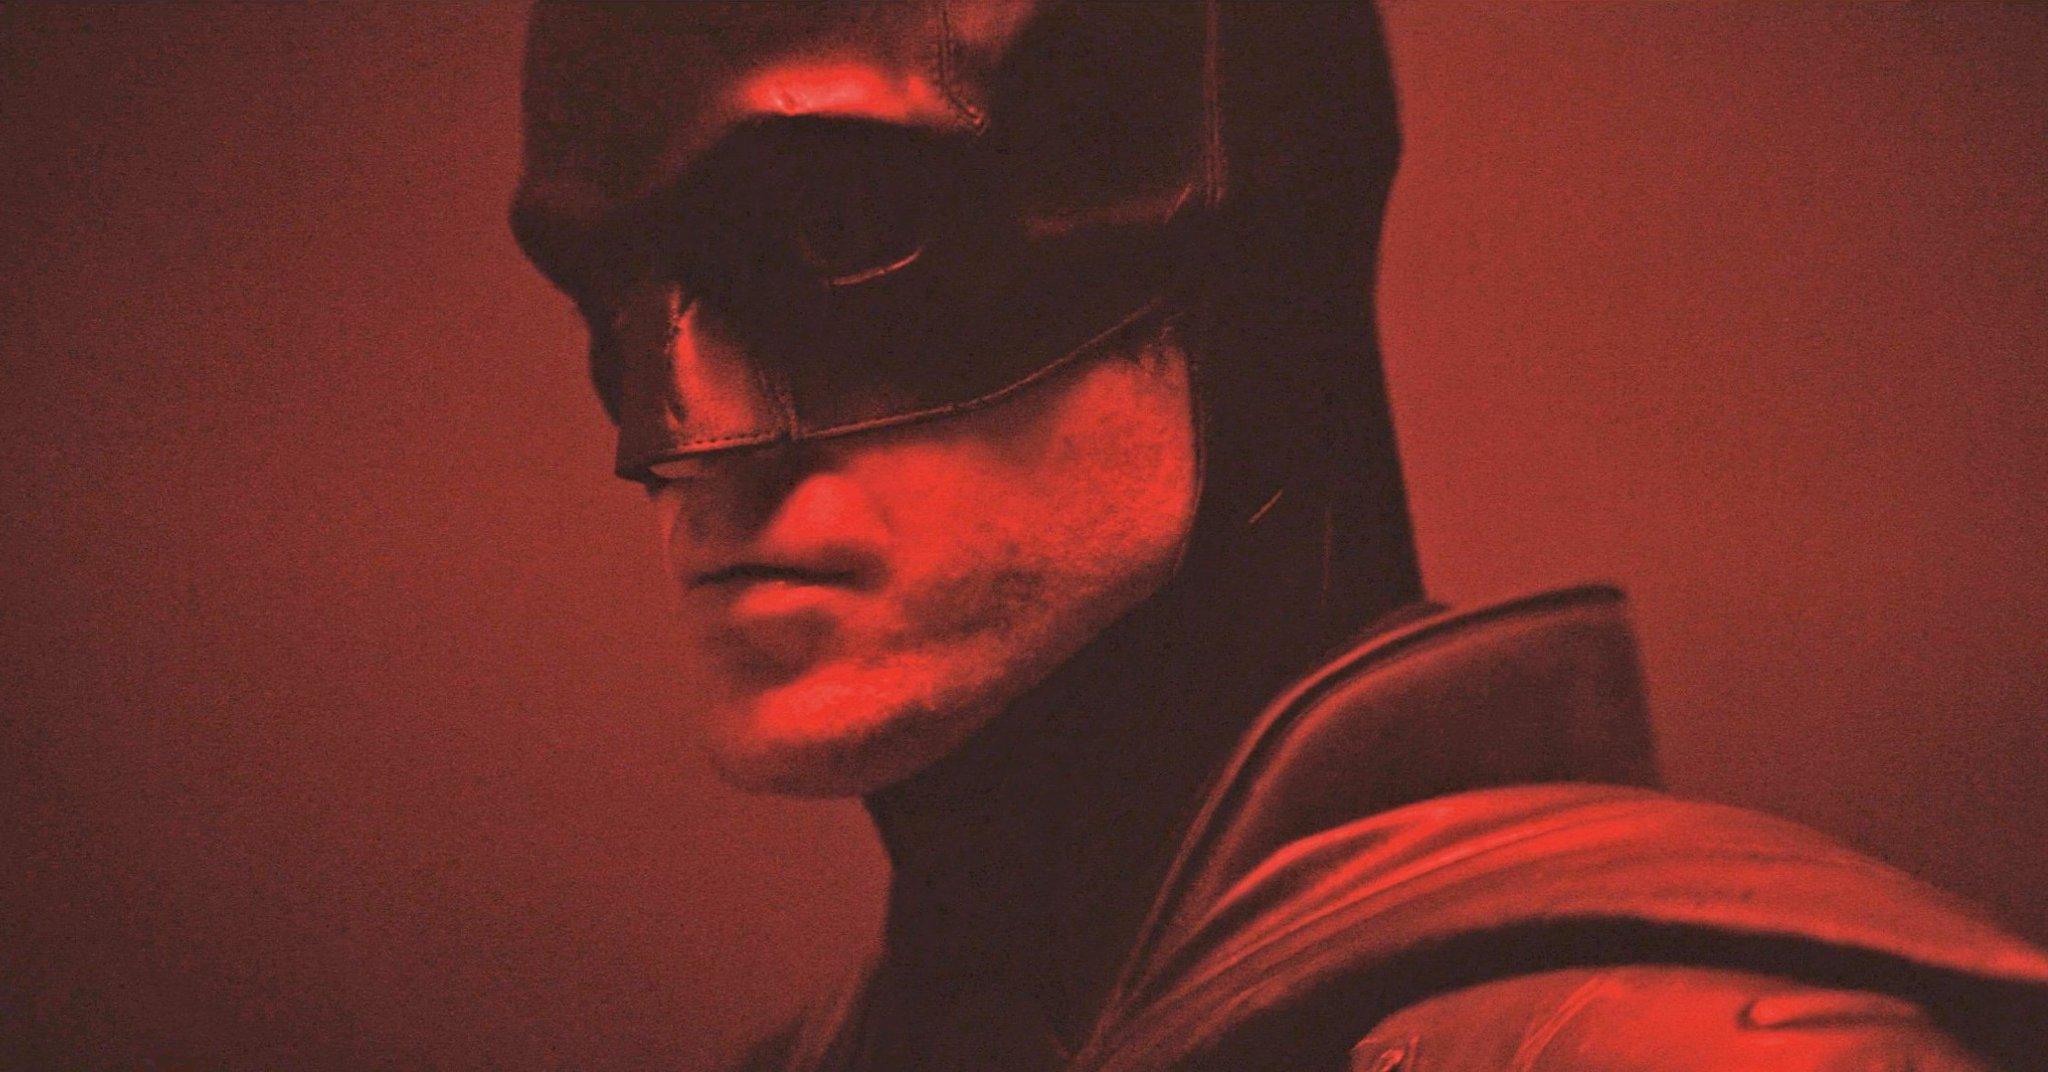 La serie spin-off de The Batman-posdata digital press